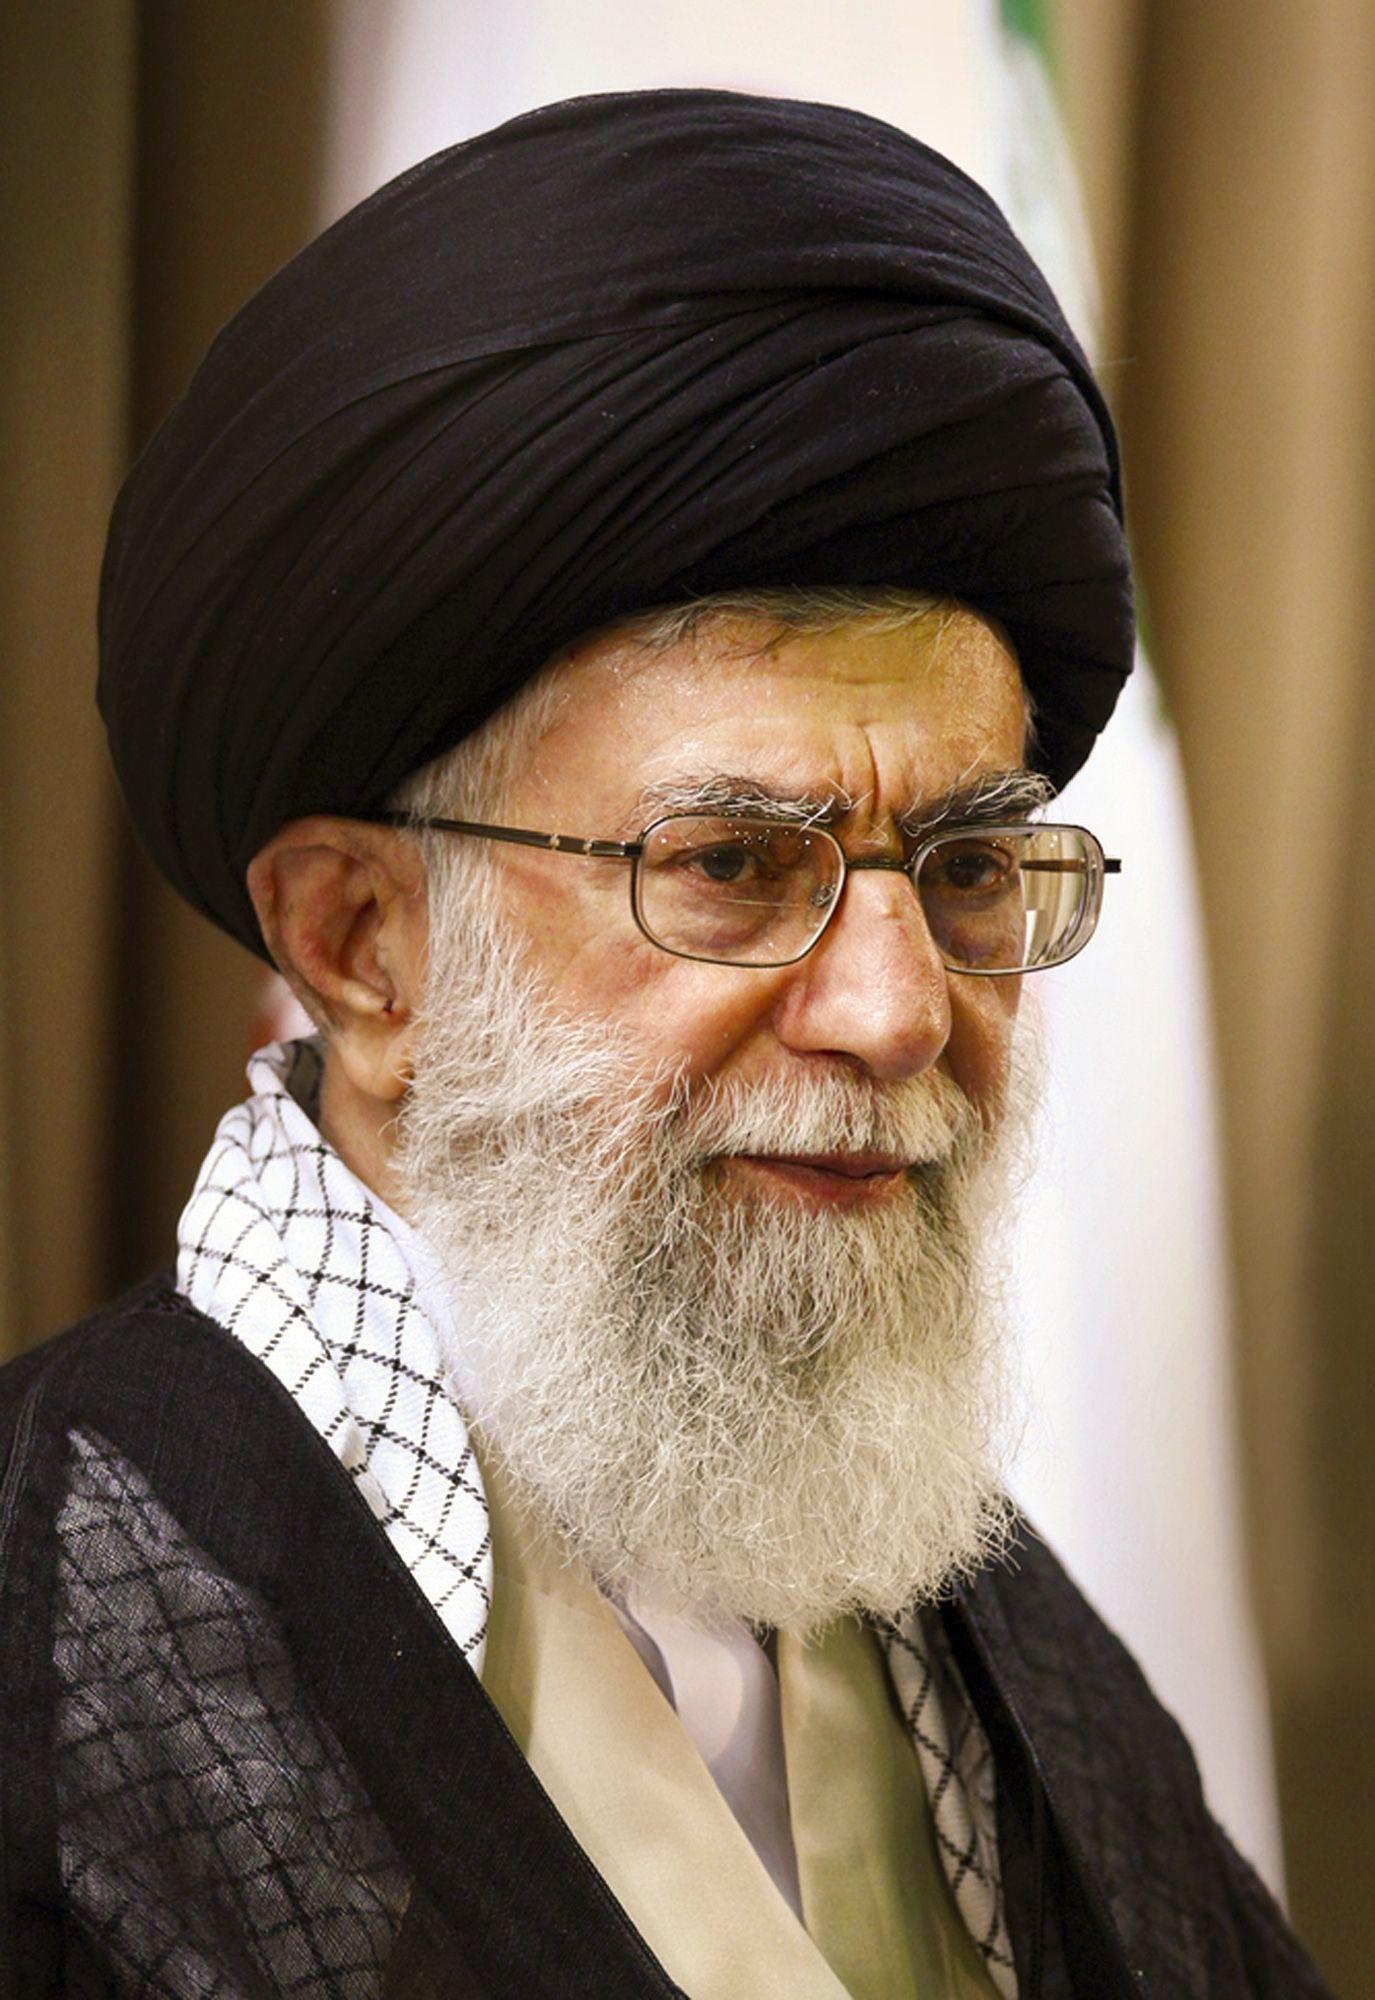 The Mullah Ali Khamenei Unhappy Ibn Ali Islamic Pictures